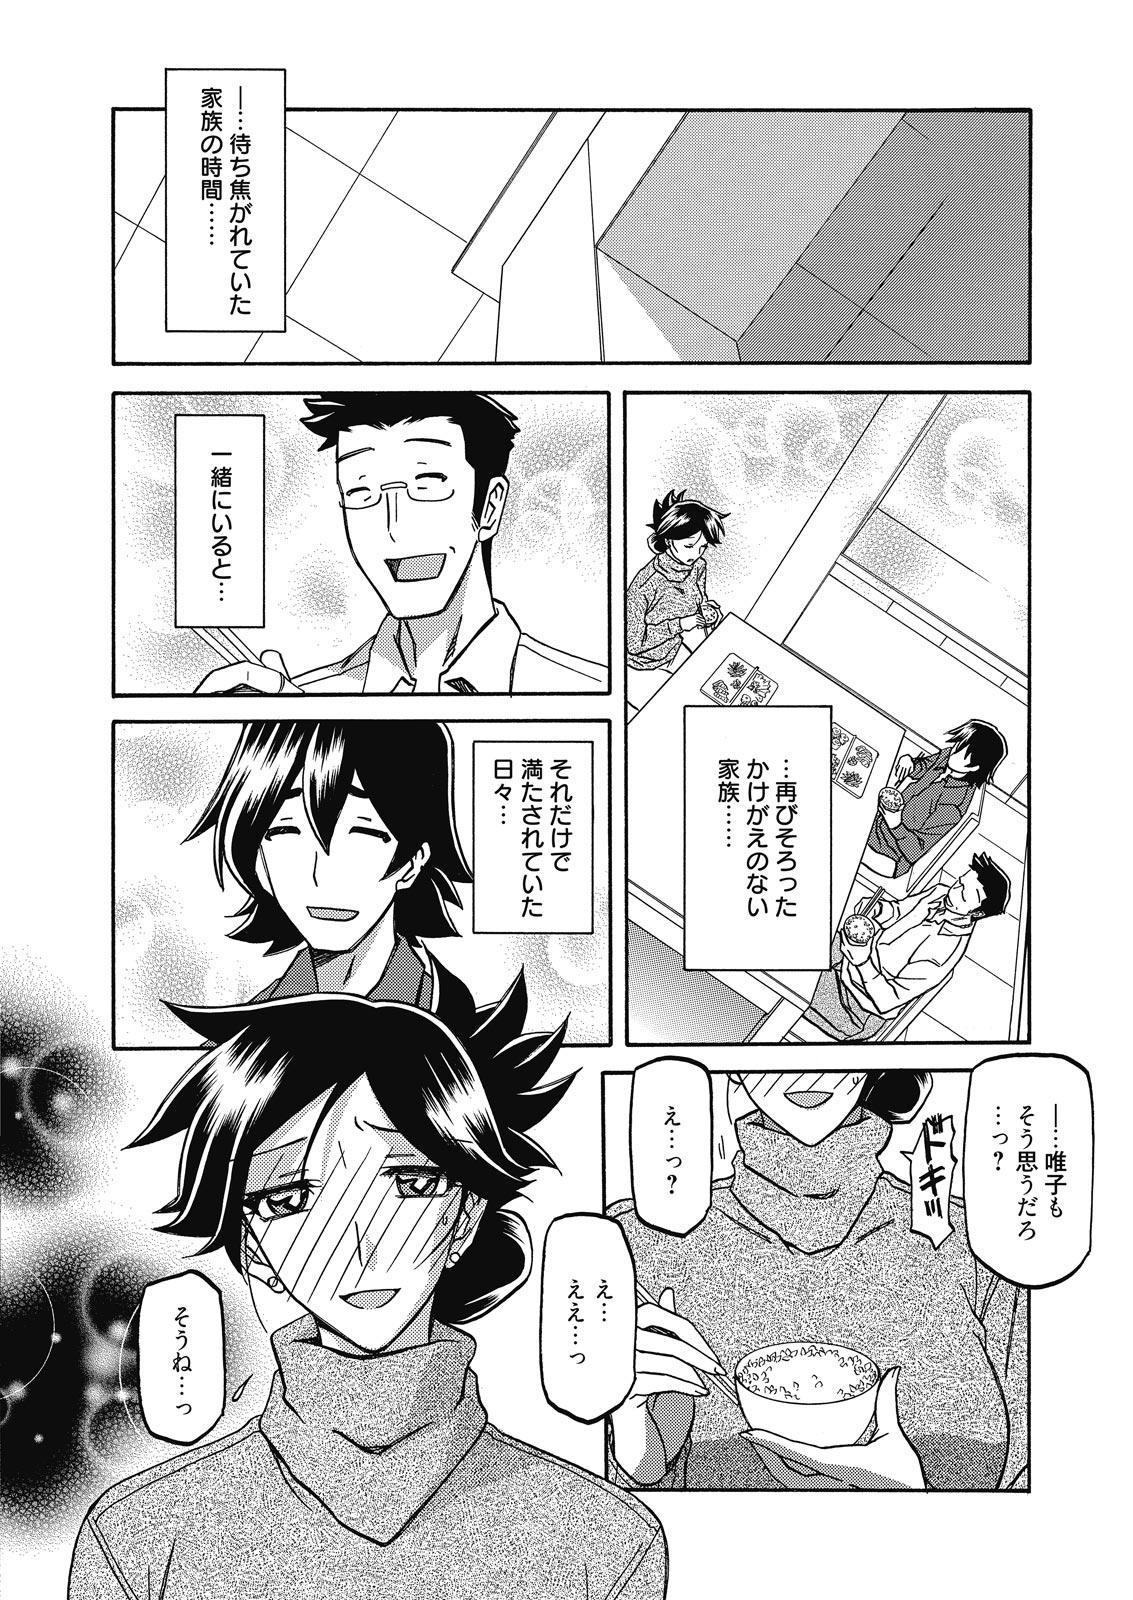 Web Manga Bangaichi Vol. 7 59